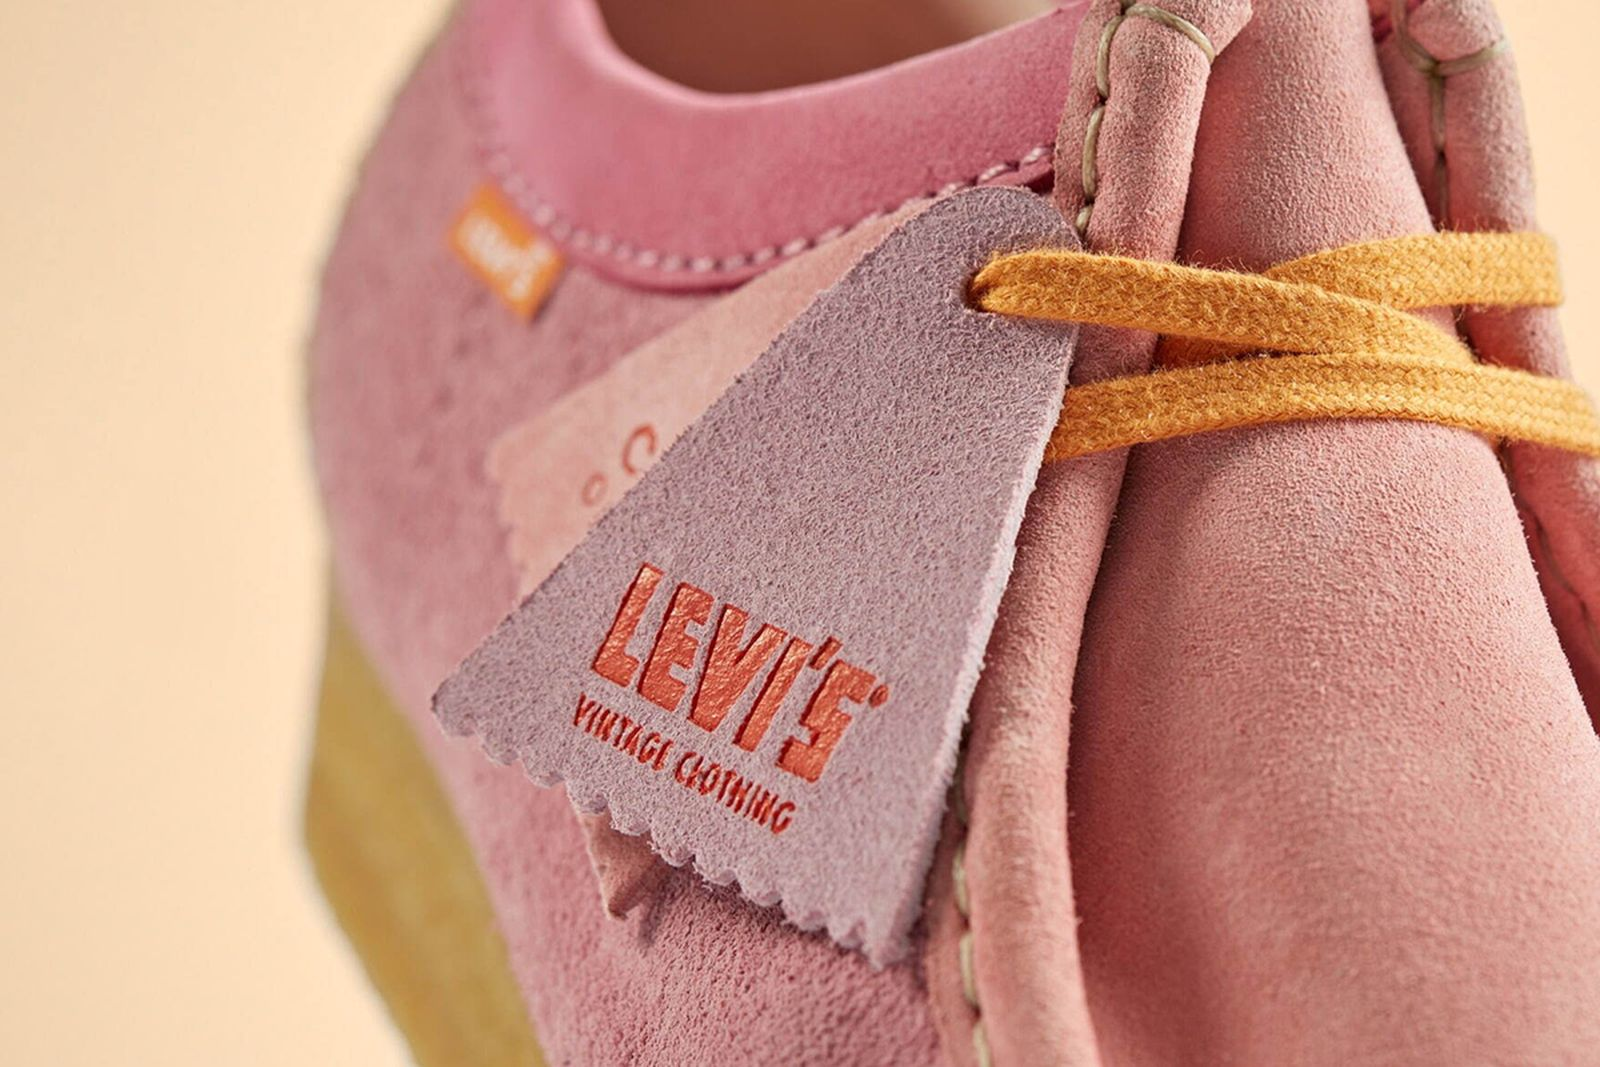 levis-vintage-clothing-clarks-originals-collab-ss21 (5)